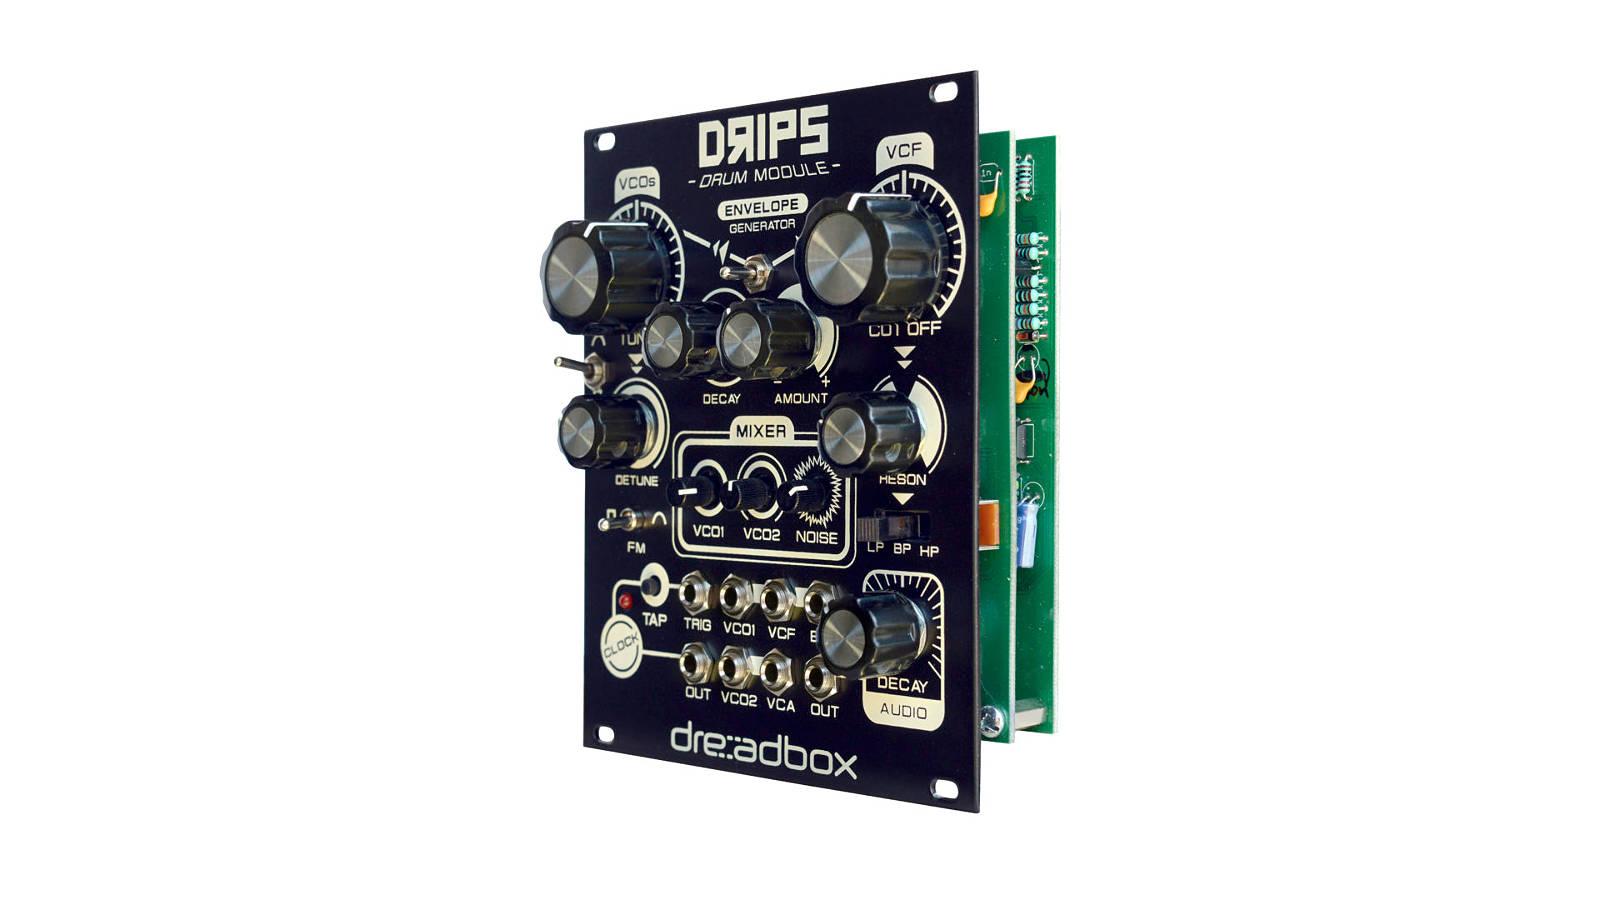 dreadbox DRIPS Modular